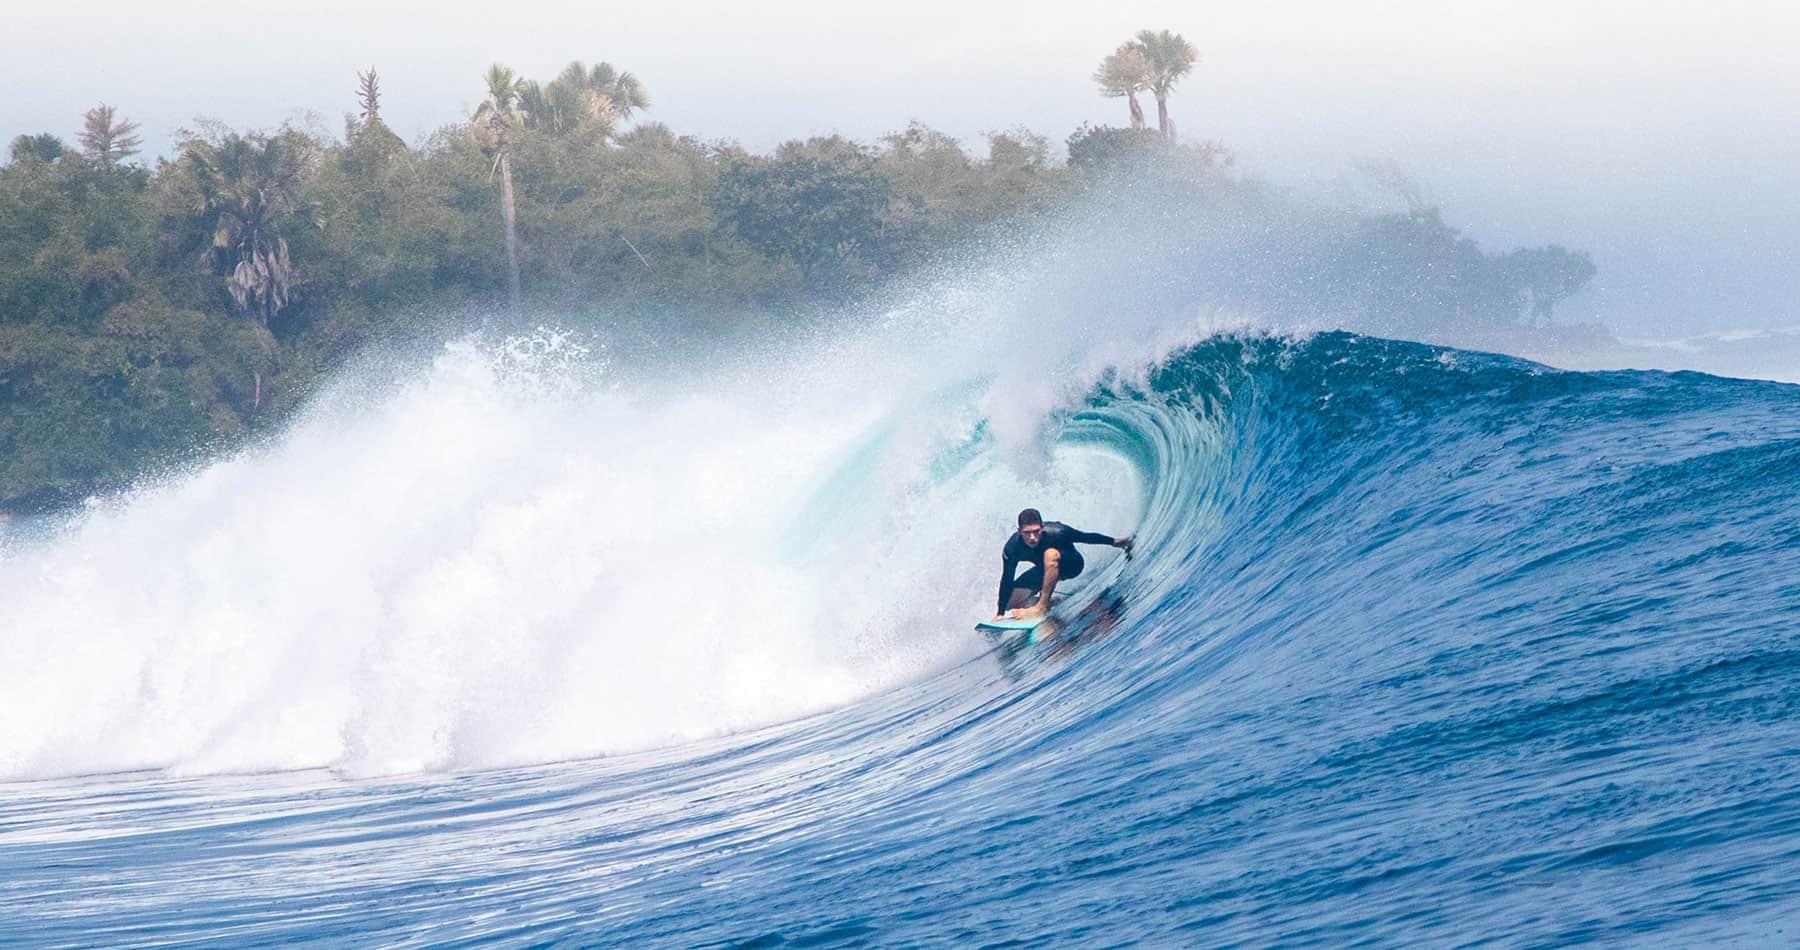 surfing in bali guide bali surf camp uluwatu canggu learn to surf